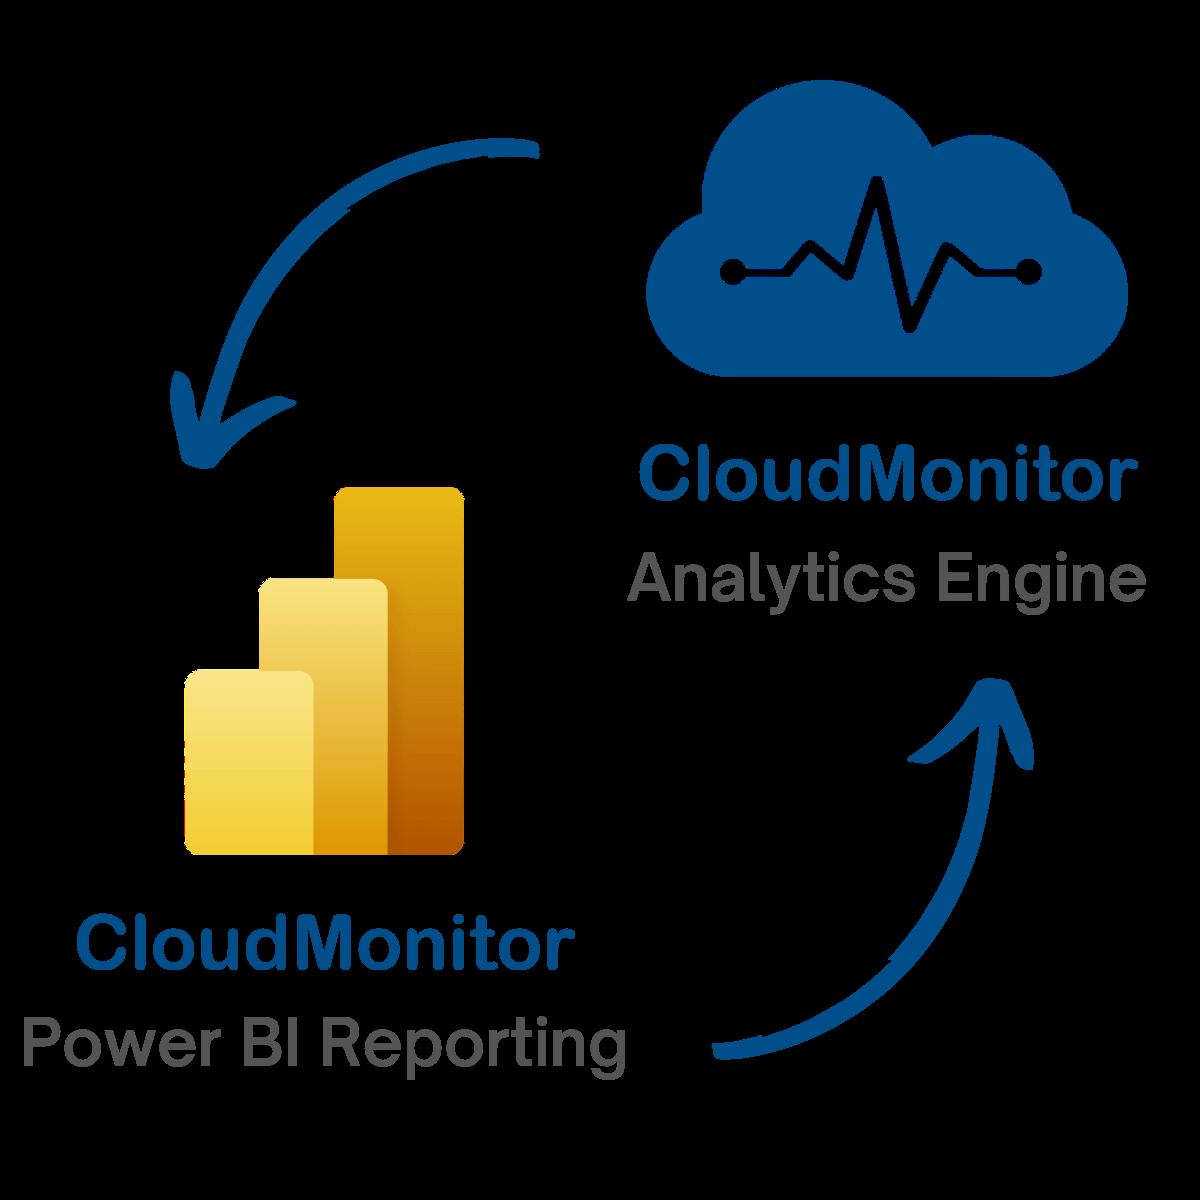 Connect Power BI Reporting adn Analytics Engine